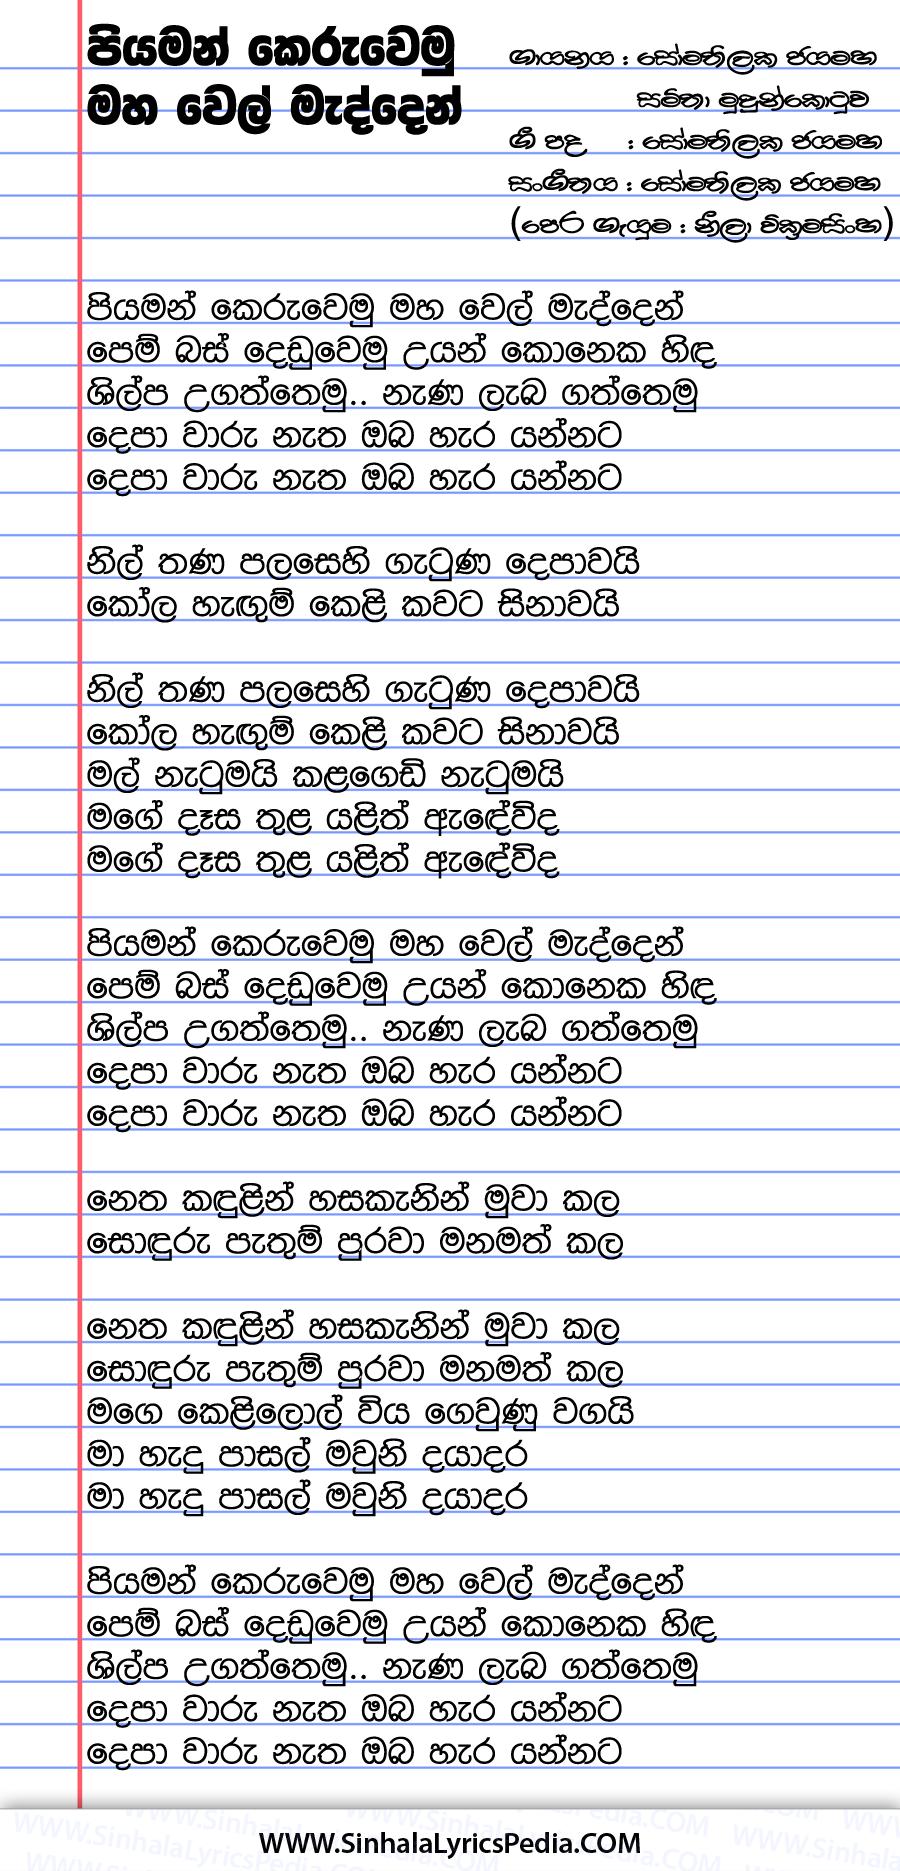 Piyaman Keruwemu Maha Wel Madden Song Lyrics